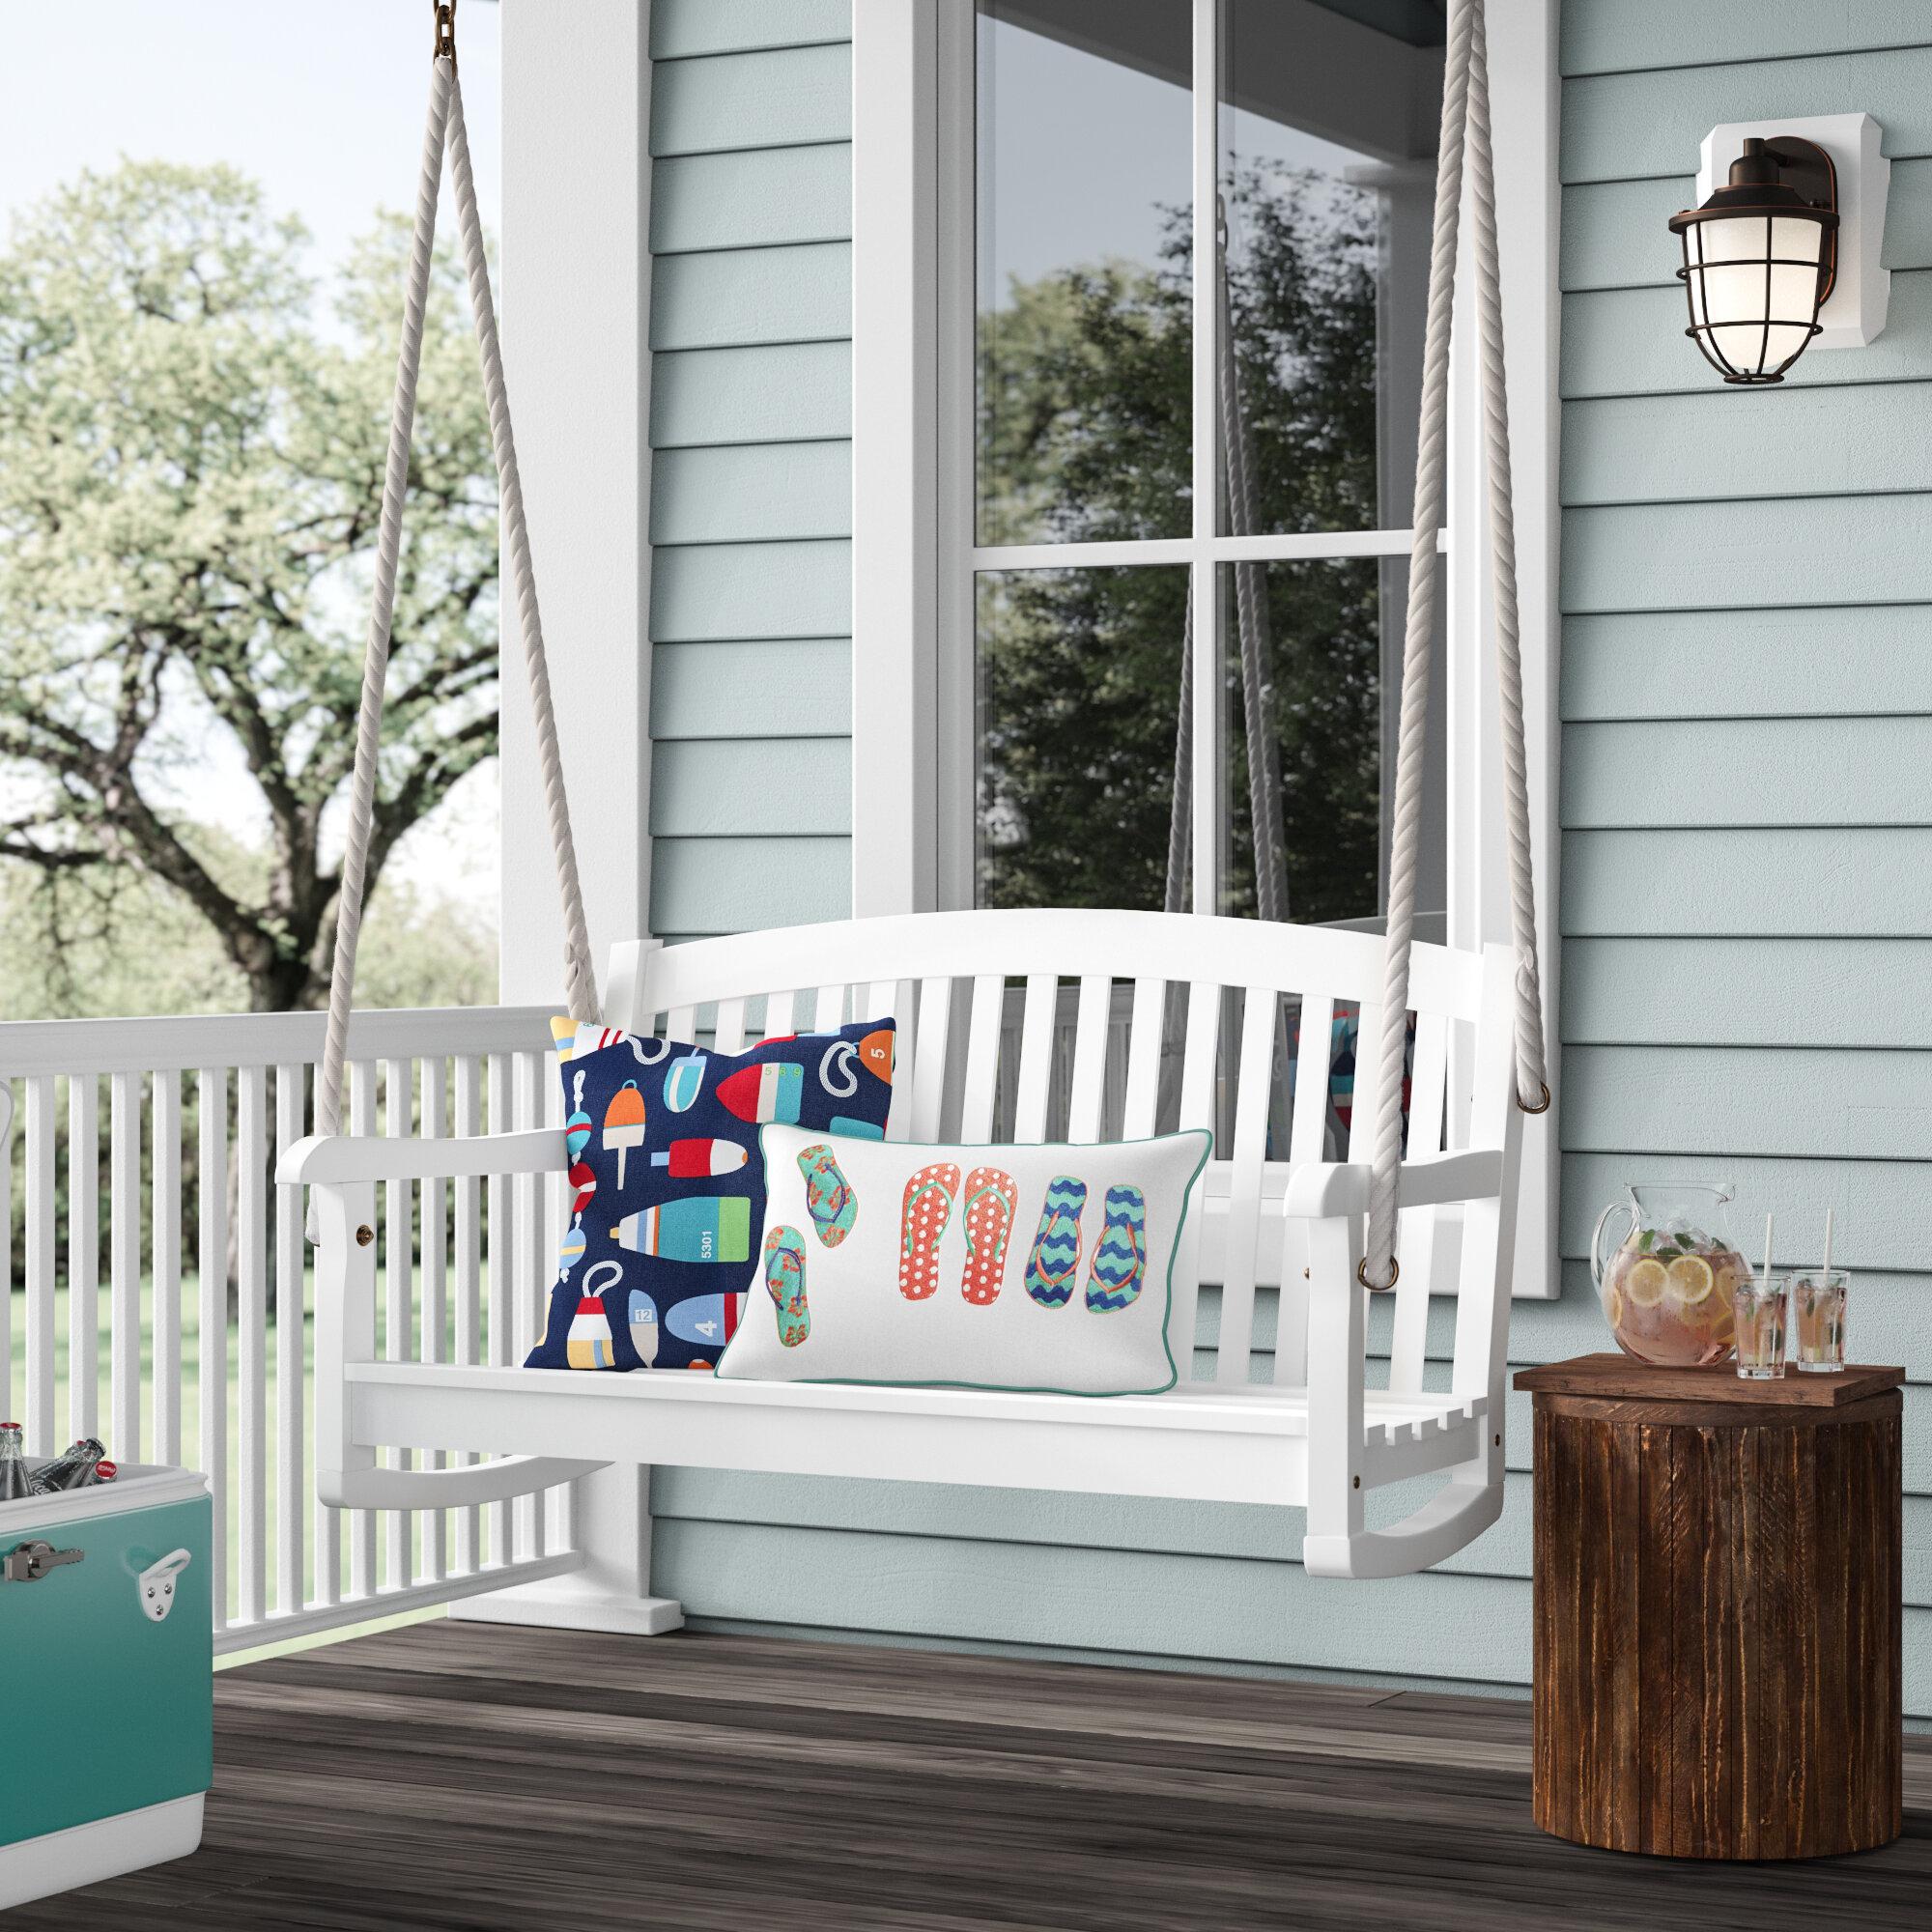 Beachcrest Home Bristol Porch Swing & Reviews | Wayfair Regarding Fordyce Porch Swings (View 12 of 25)